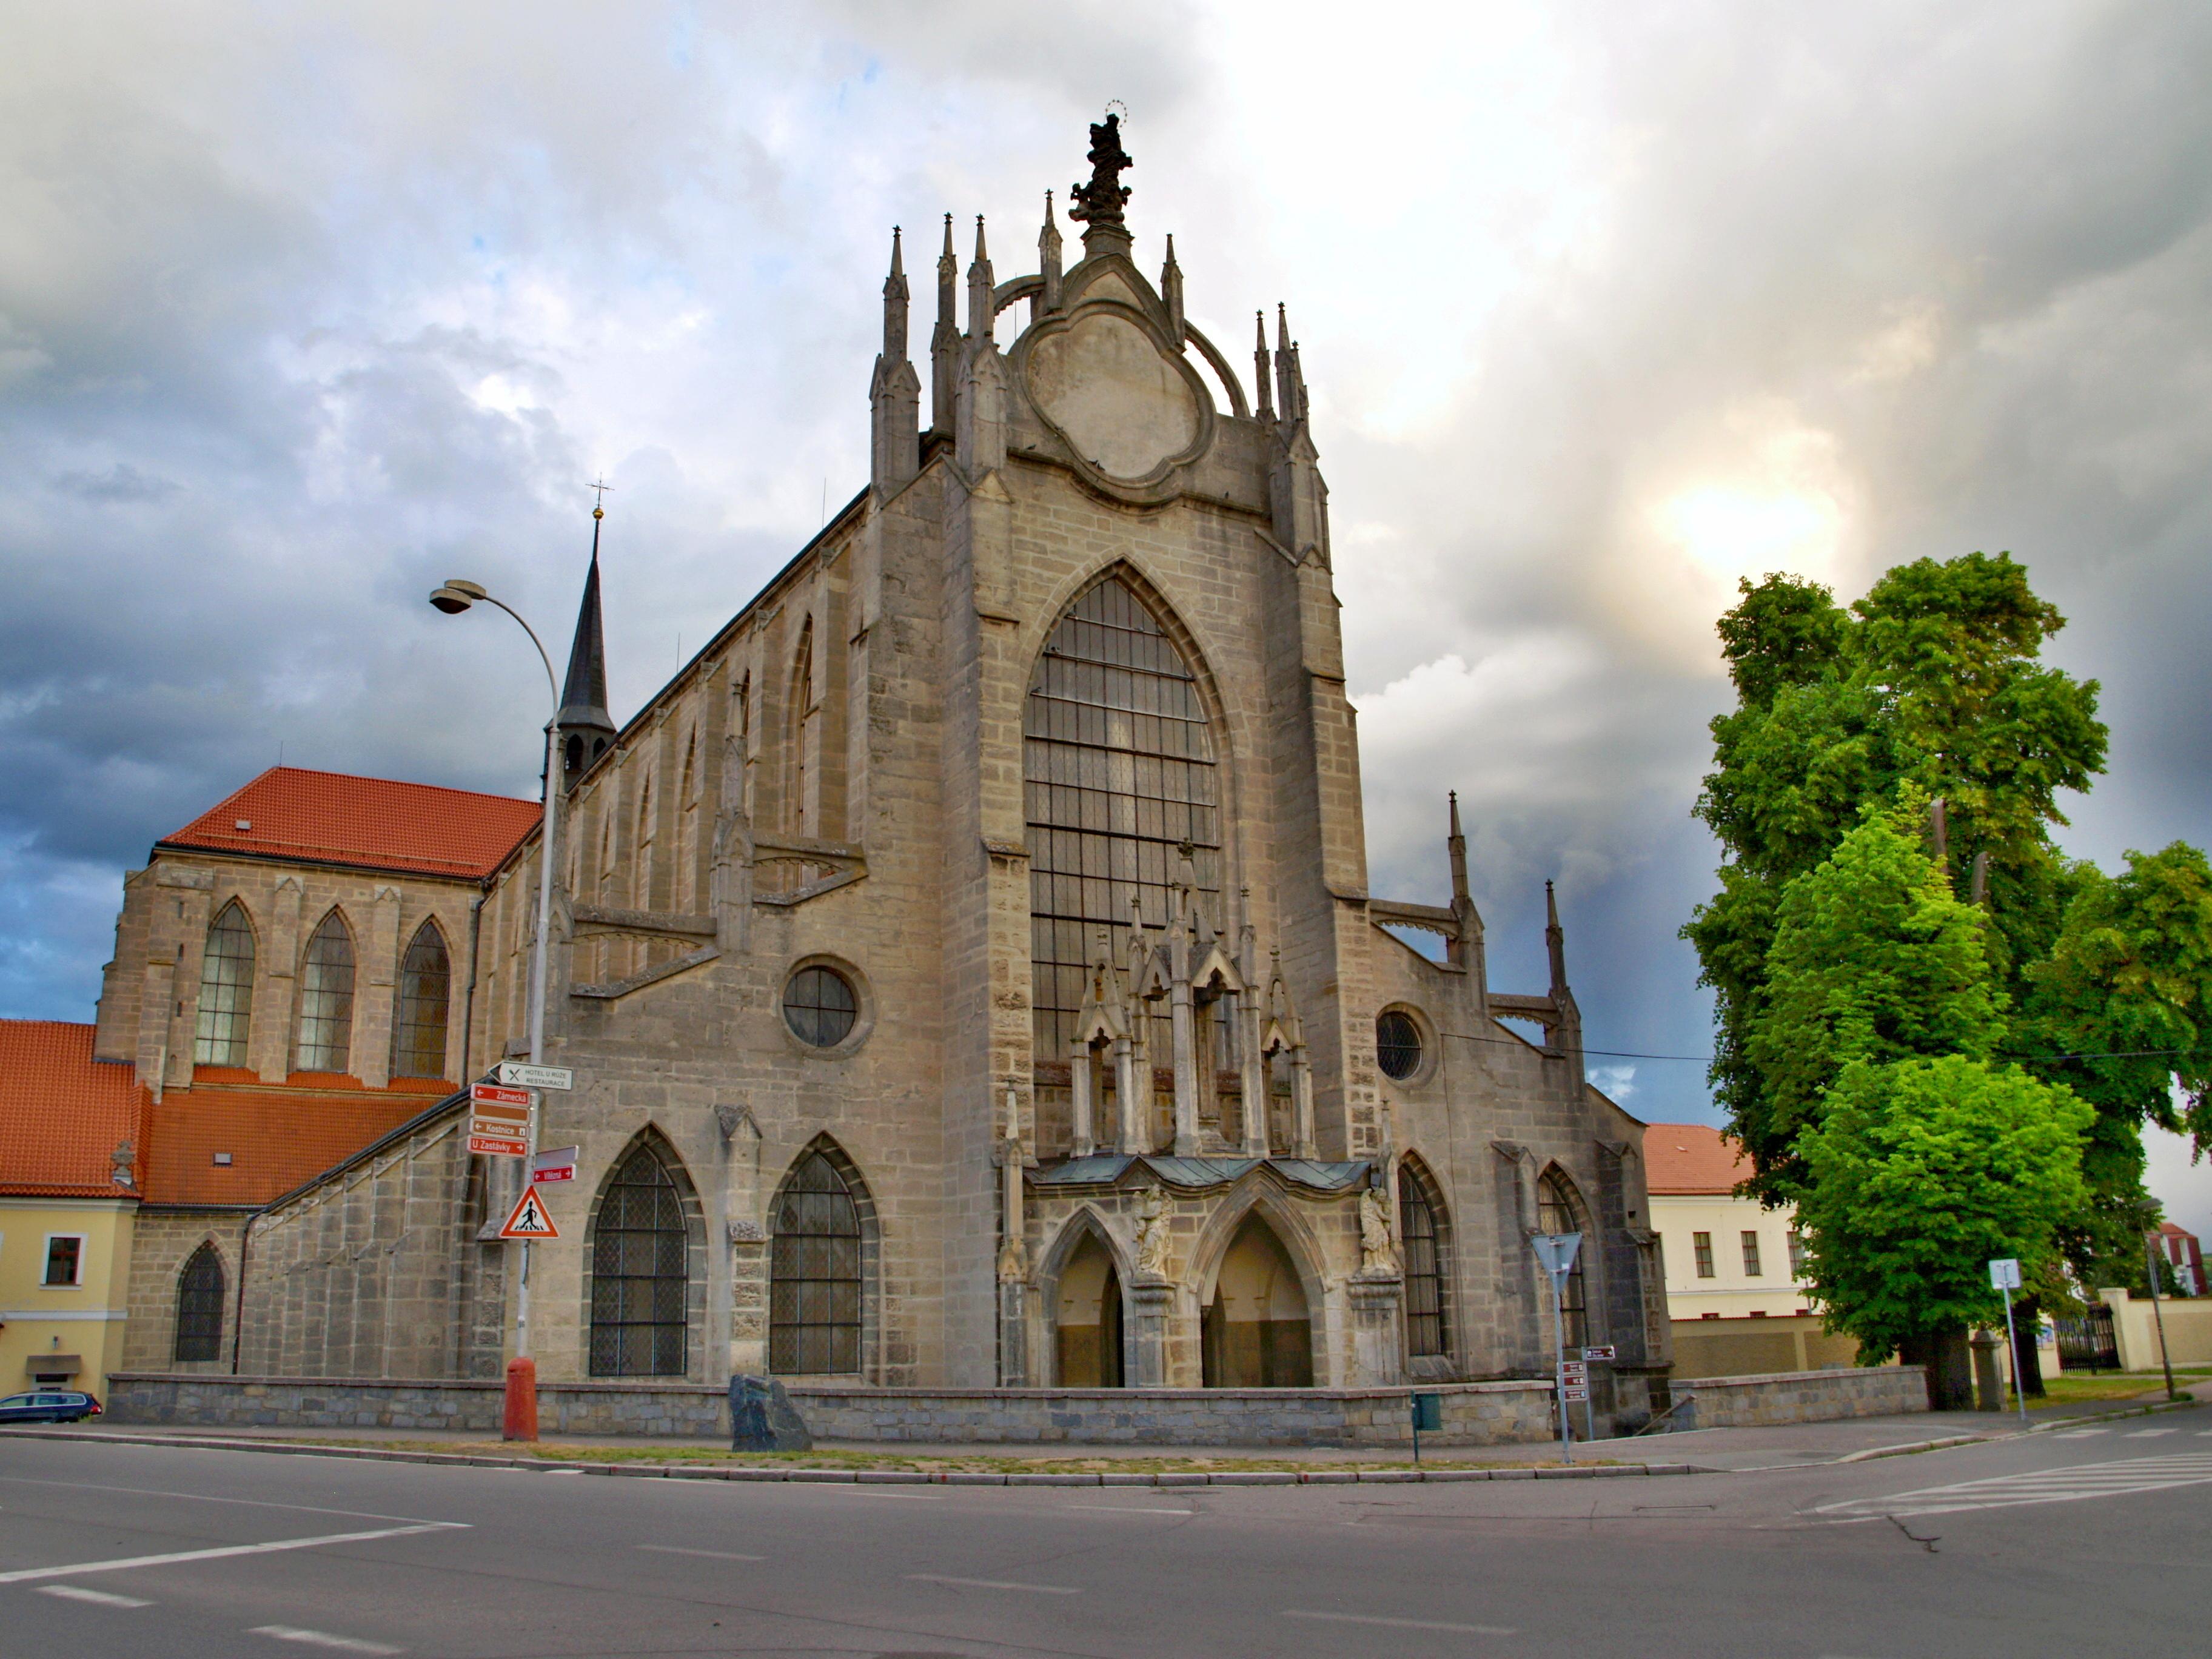 5590-katedrala-nanebevzeti-panny-marie-a-sv-jana-krtitele-cathedral-of-assumption-of-our-lady-and-st-john-the-baptist.jpg